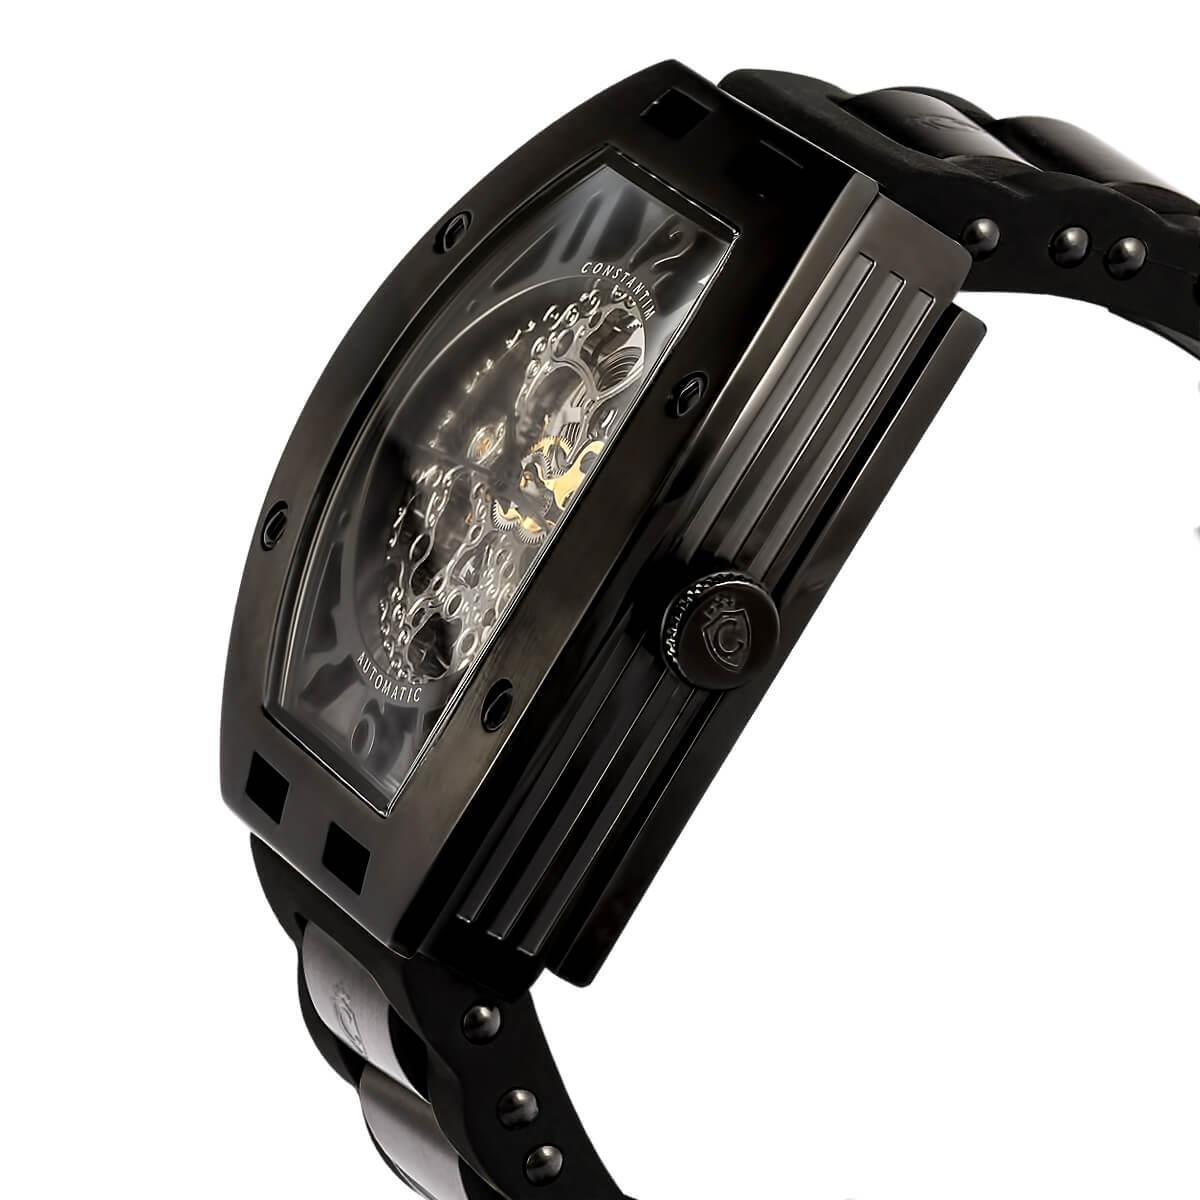 3b6d9c16f1b Relógio Masculino Constantim Full Skeleton ZW30303D Special Edition  Automatic All Black